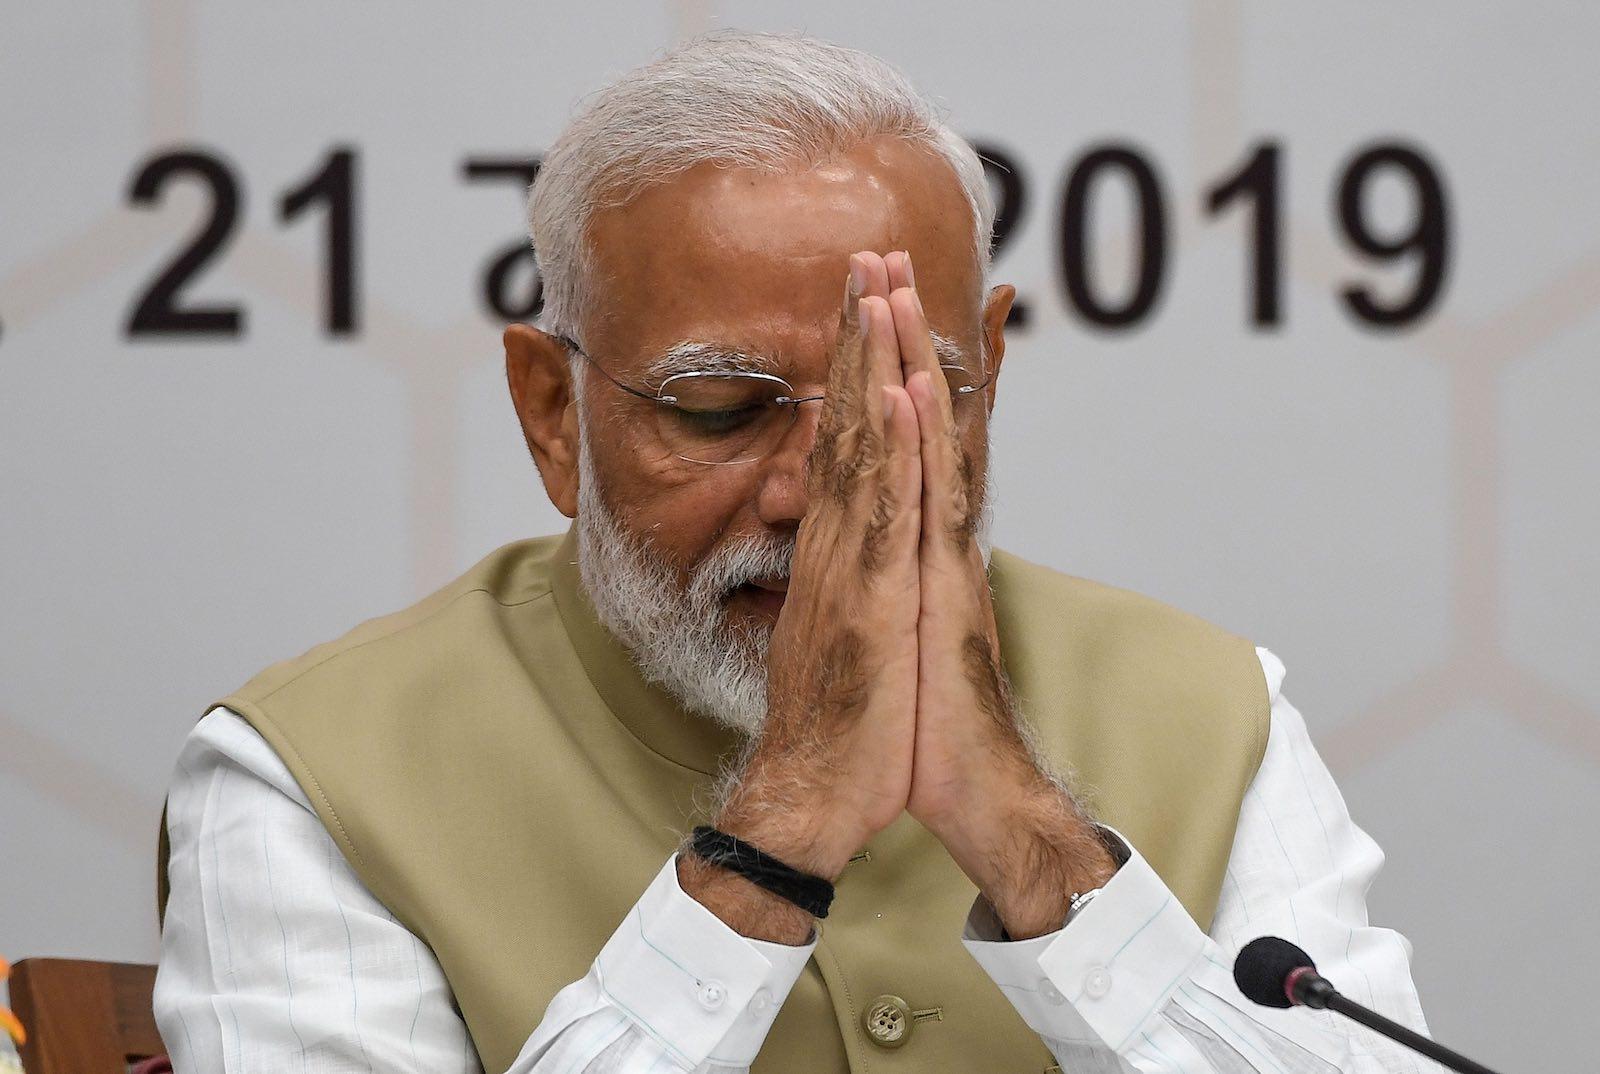 Narendra Modi is seeking a second term (Photo: Prakash Singh via Getty)